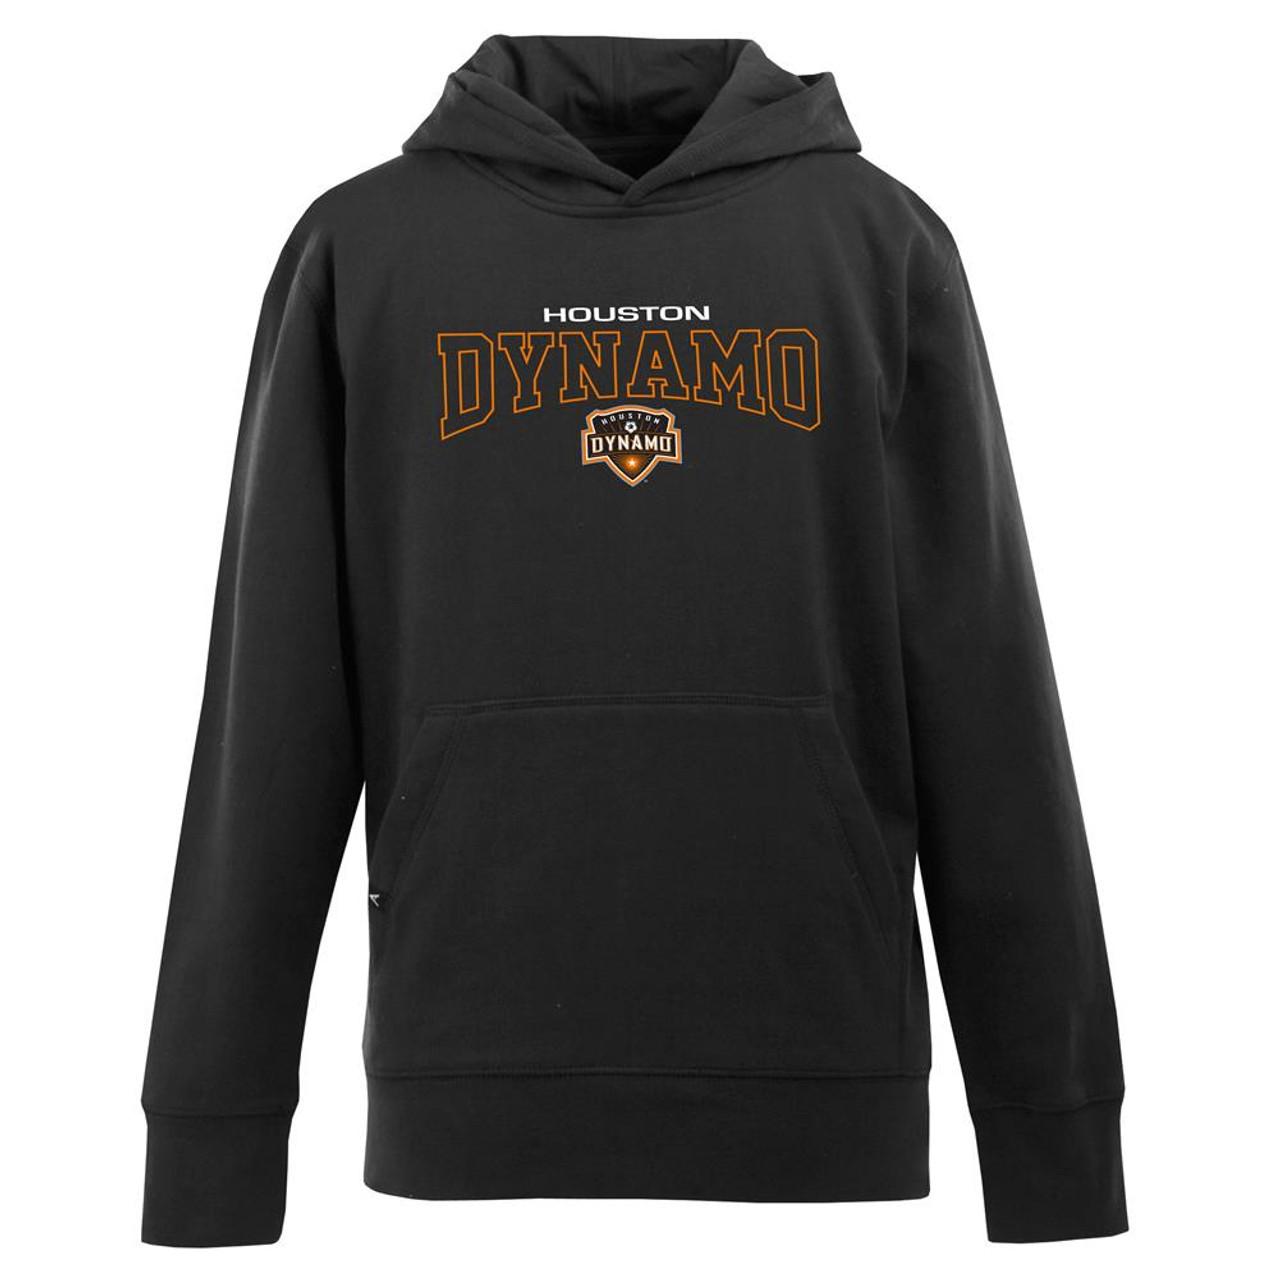 Houston Dynamo Youth Hoodie